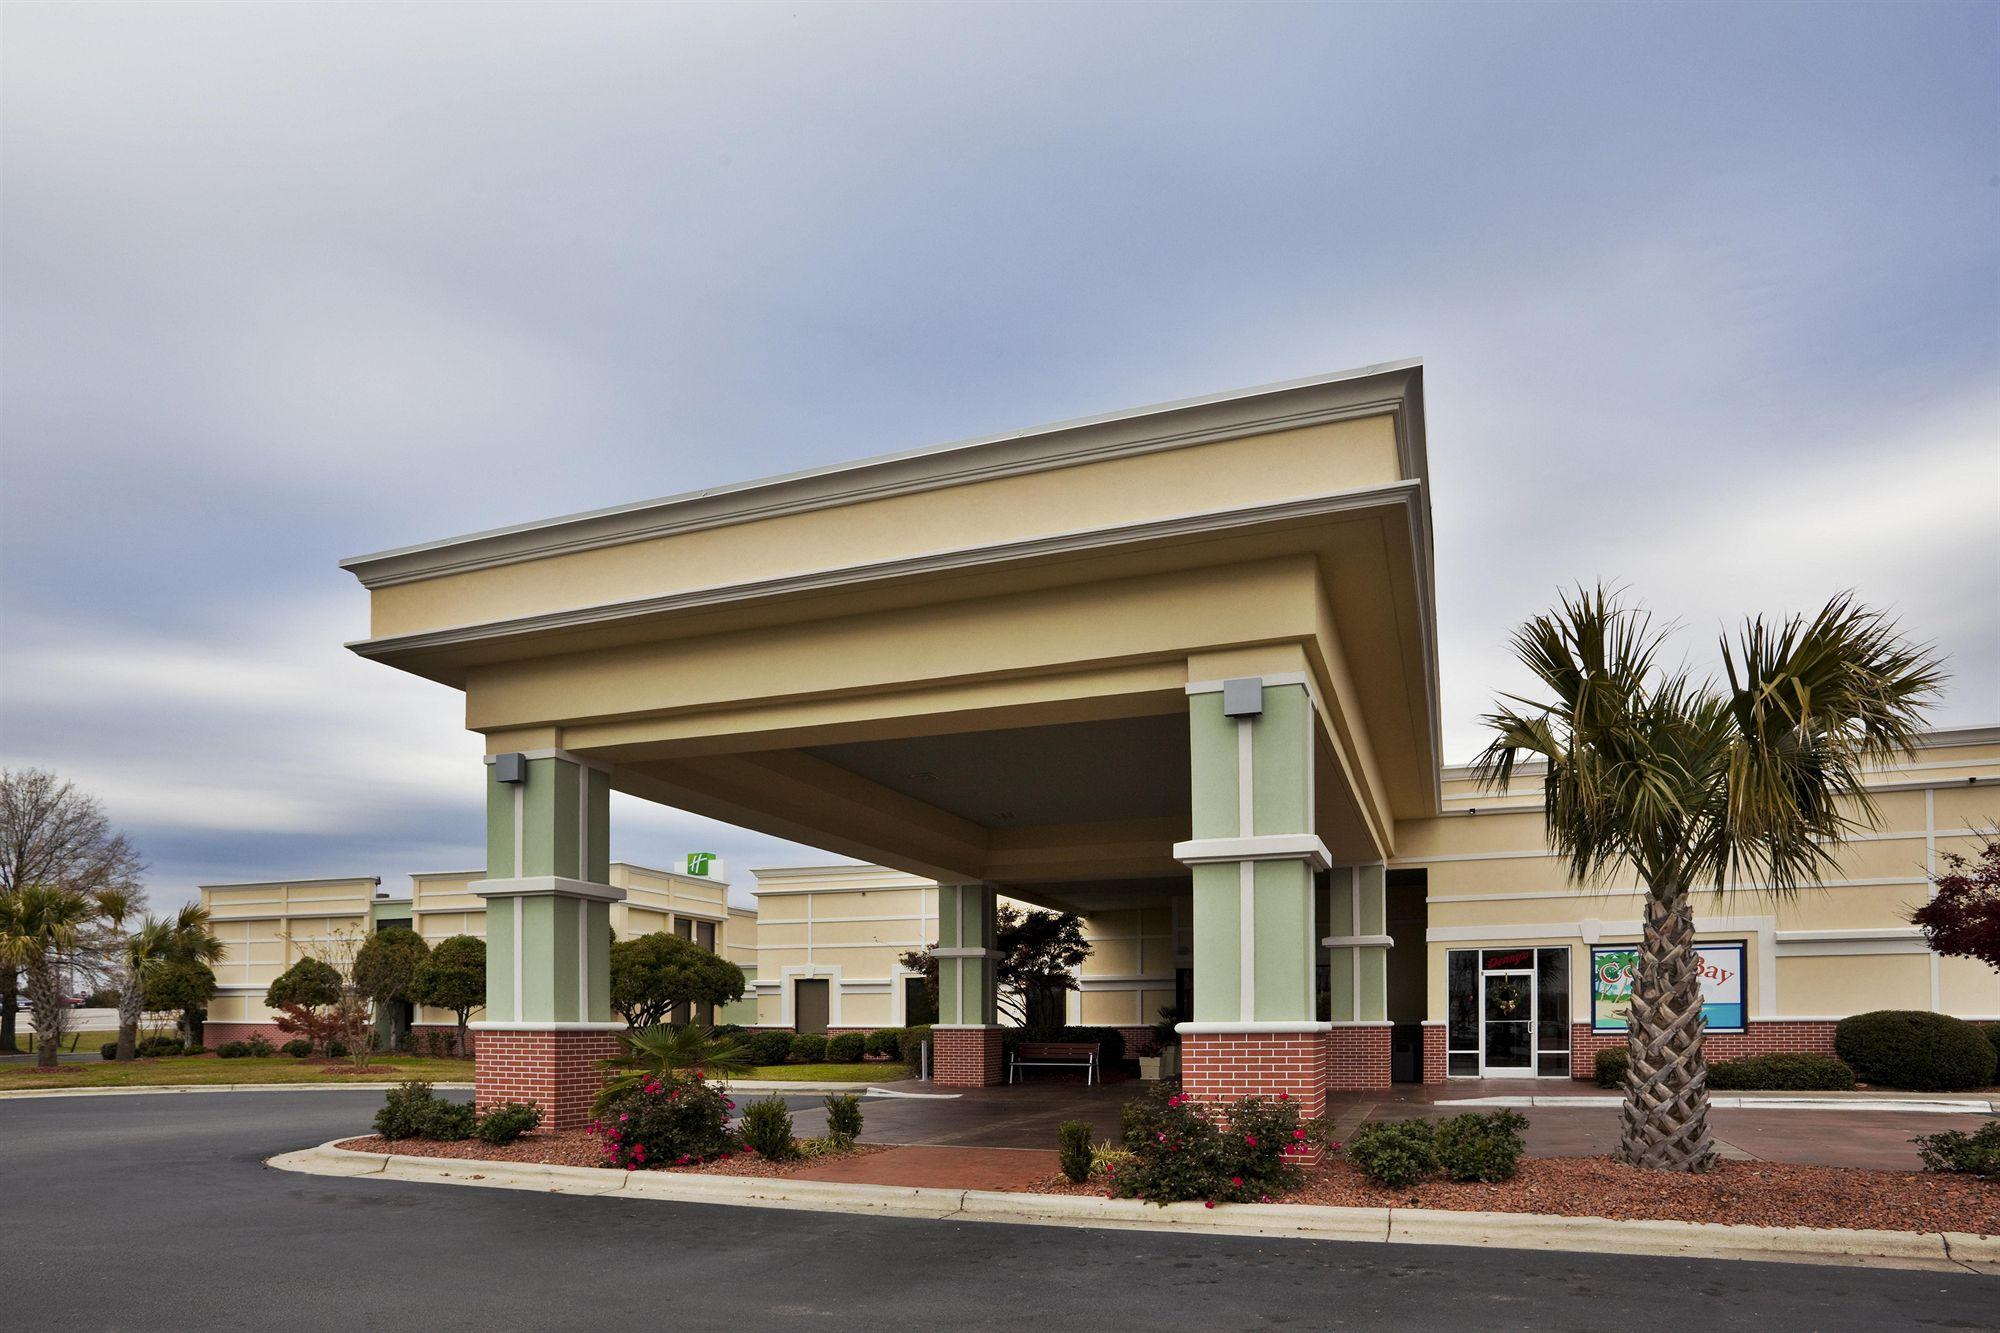 Holiday Inn in Lumberton, NC